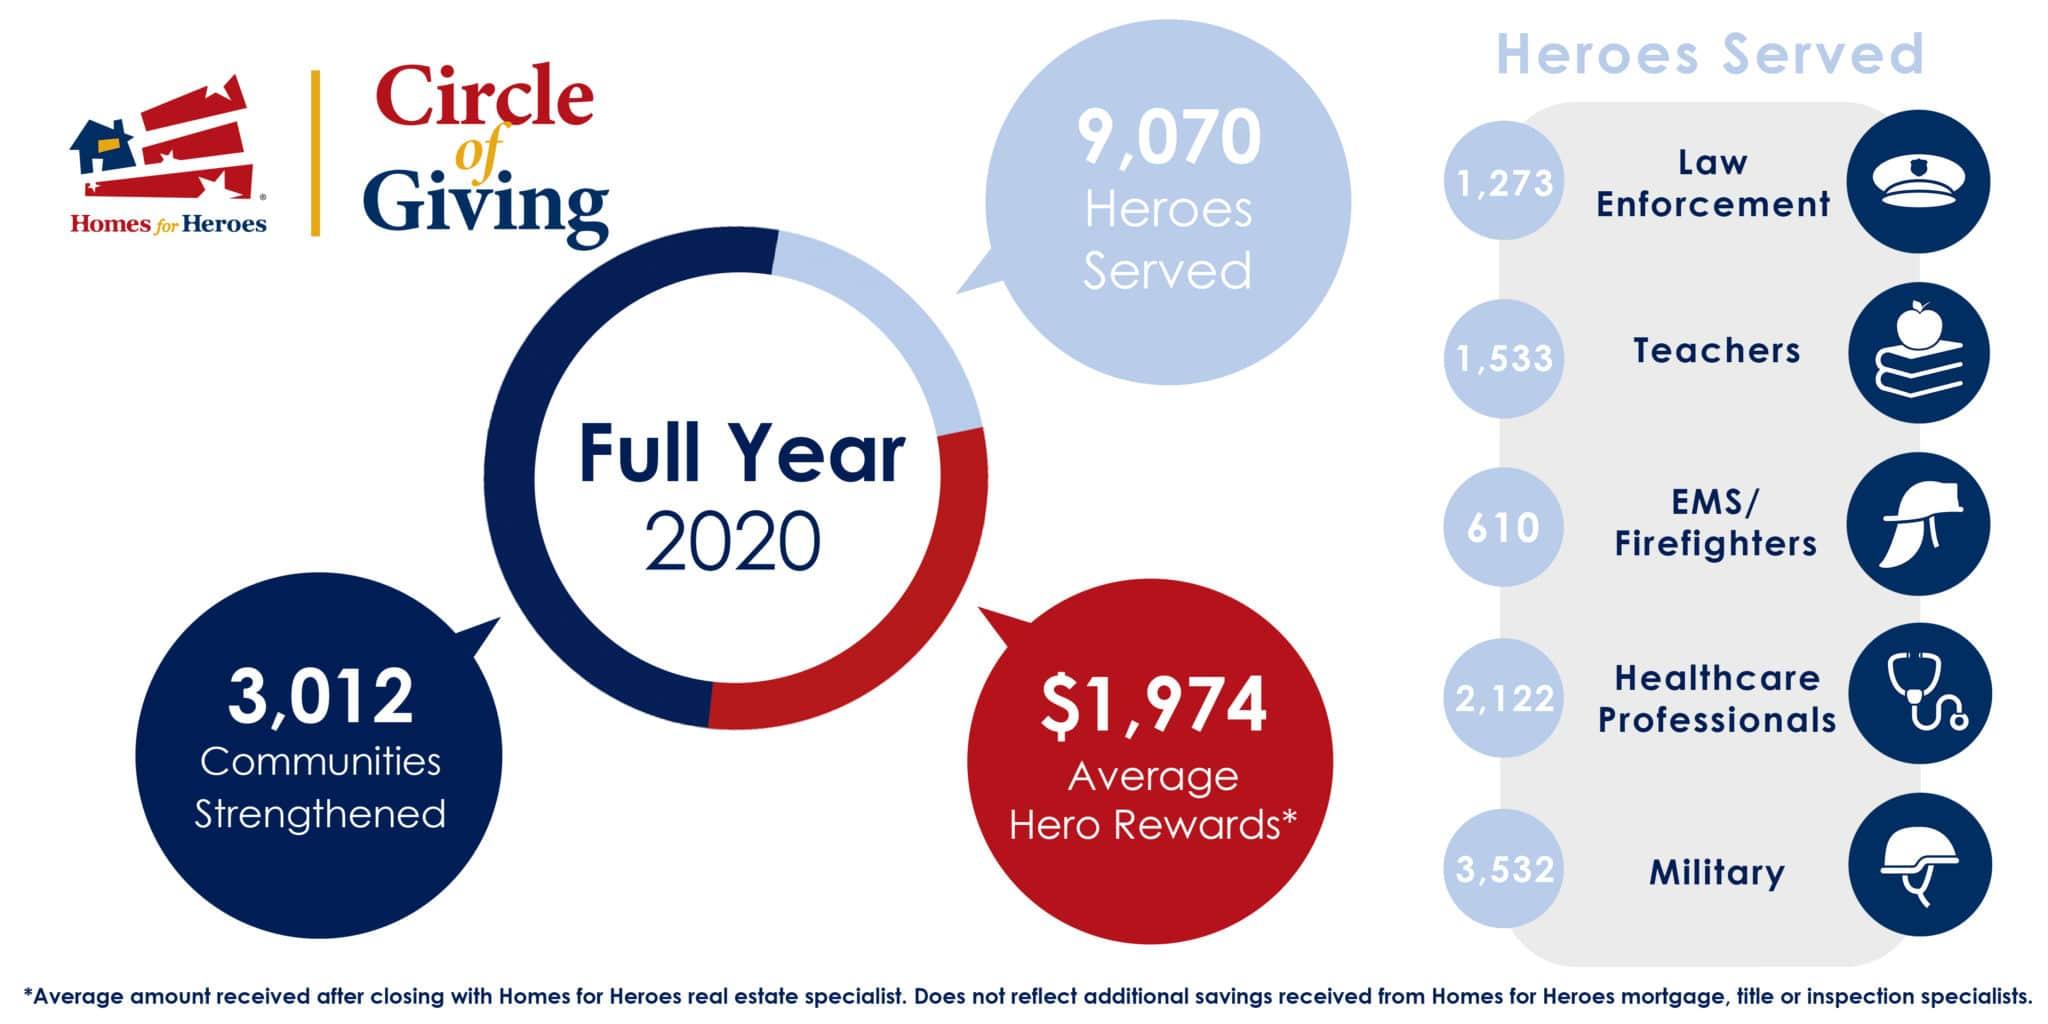 Homes for Heroes 2020 full year numbers heroes served